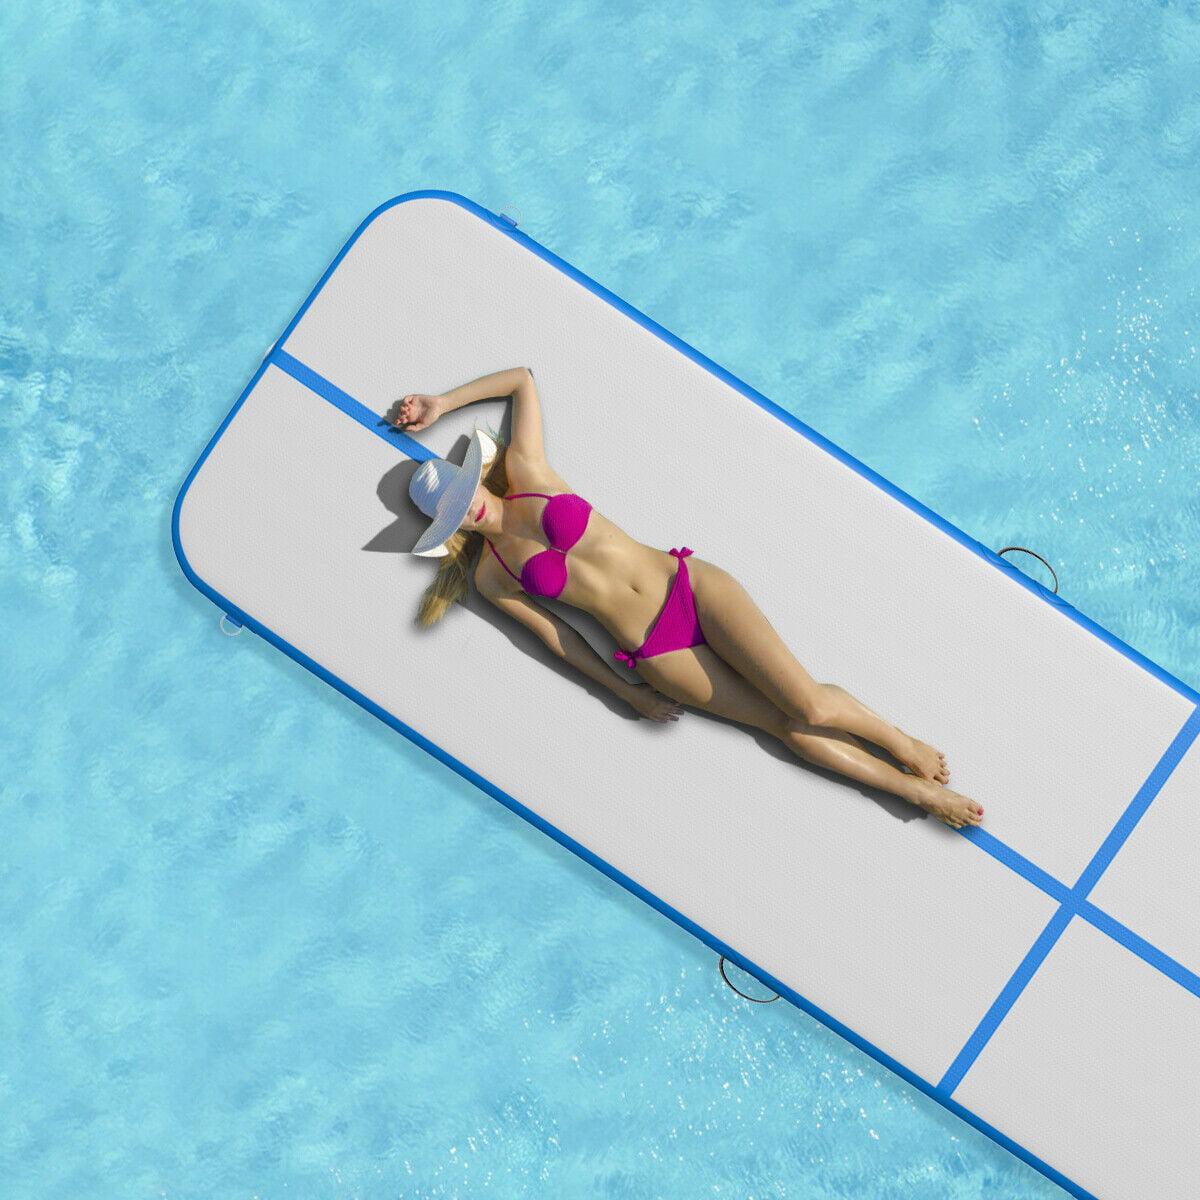 13' Inflatable Exercise Air Track Floor Mat Water Buoyancy Pump Multi-purpose - image 6 of 10